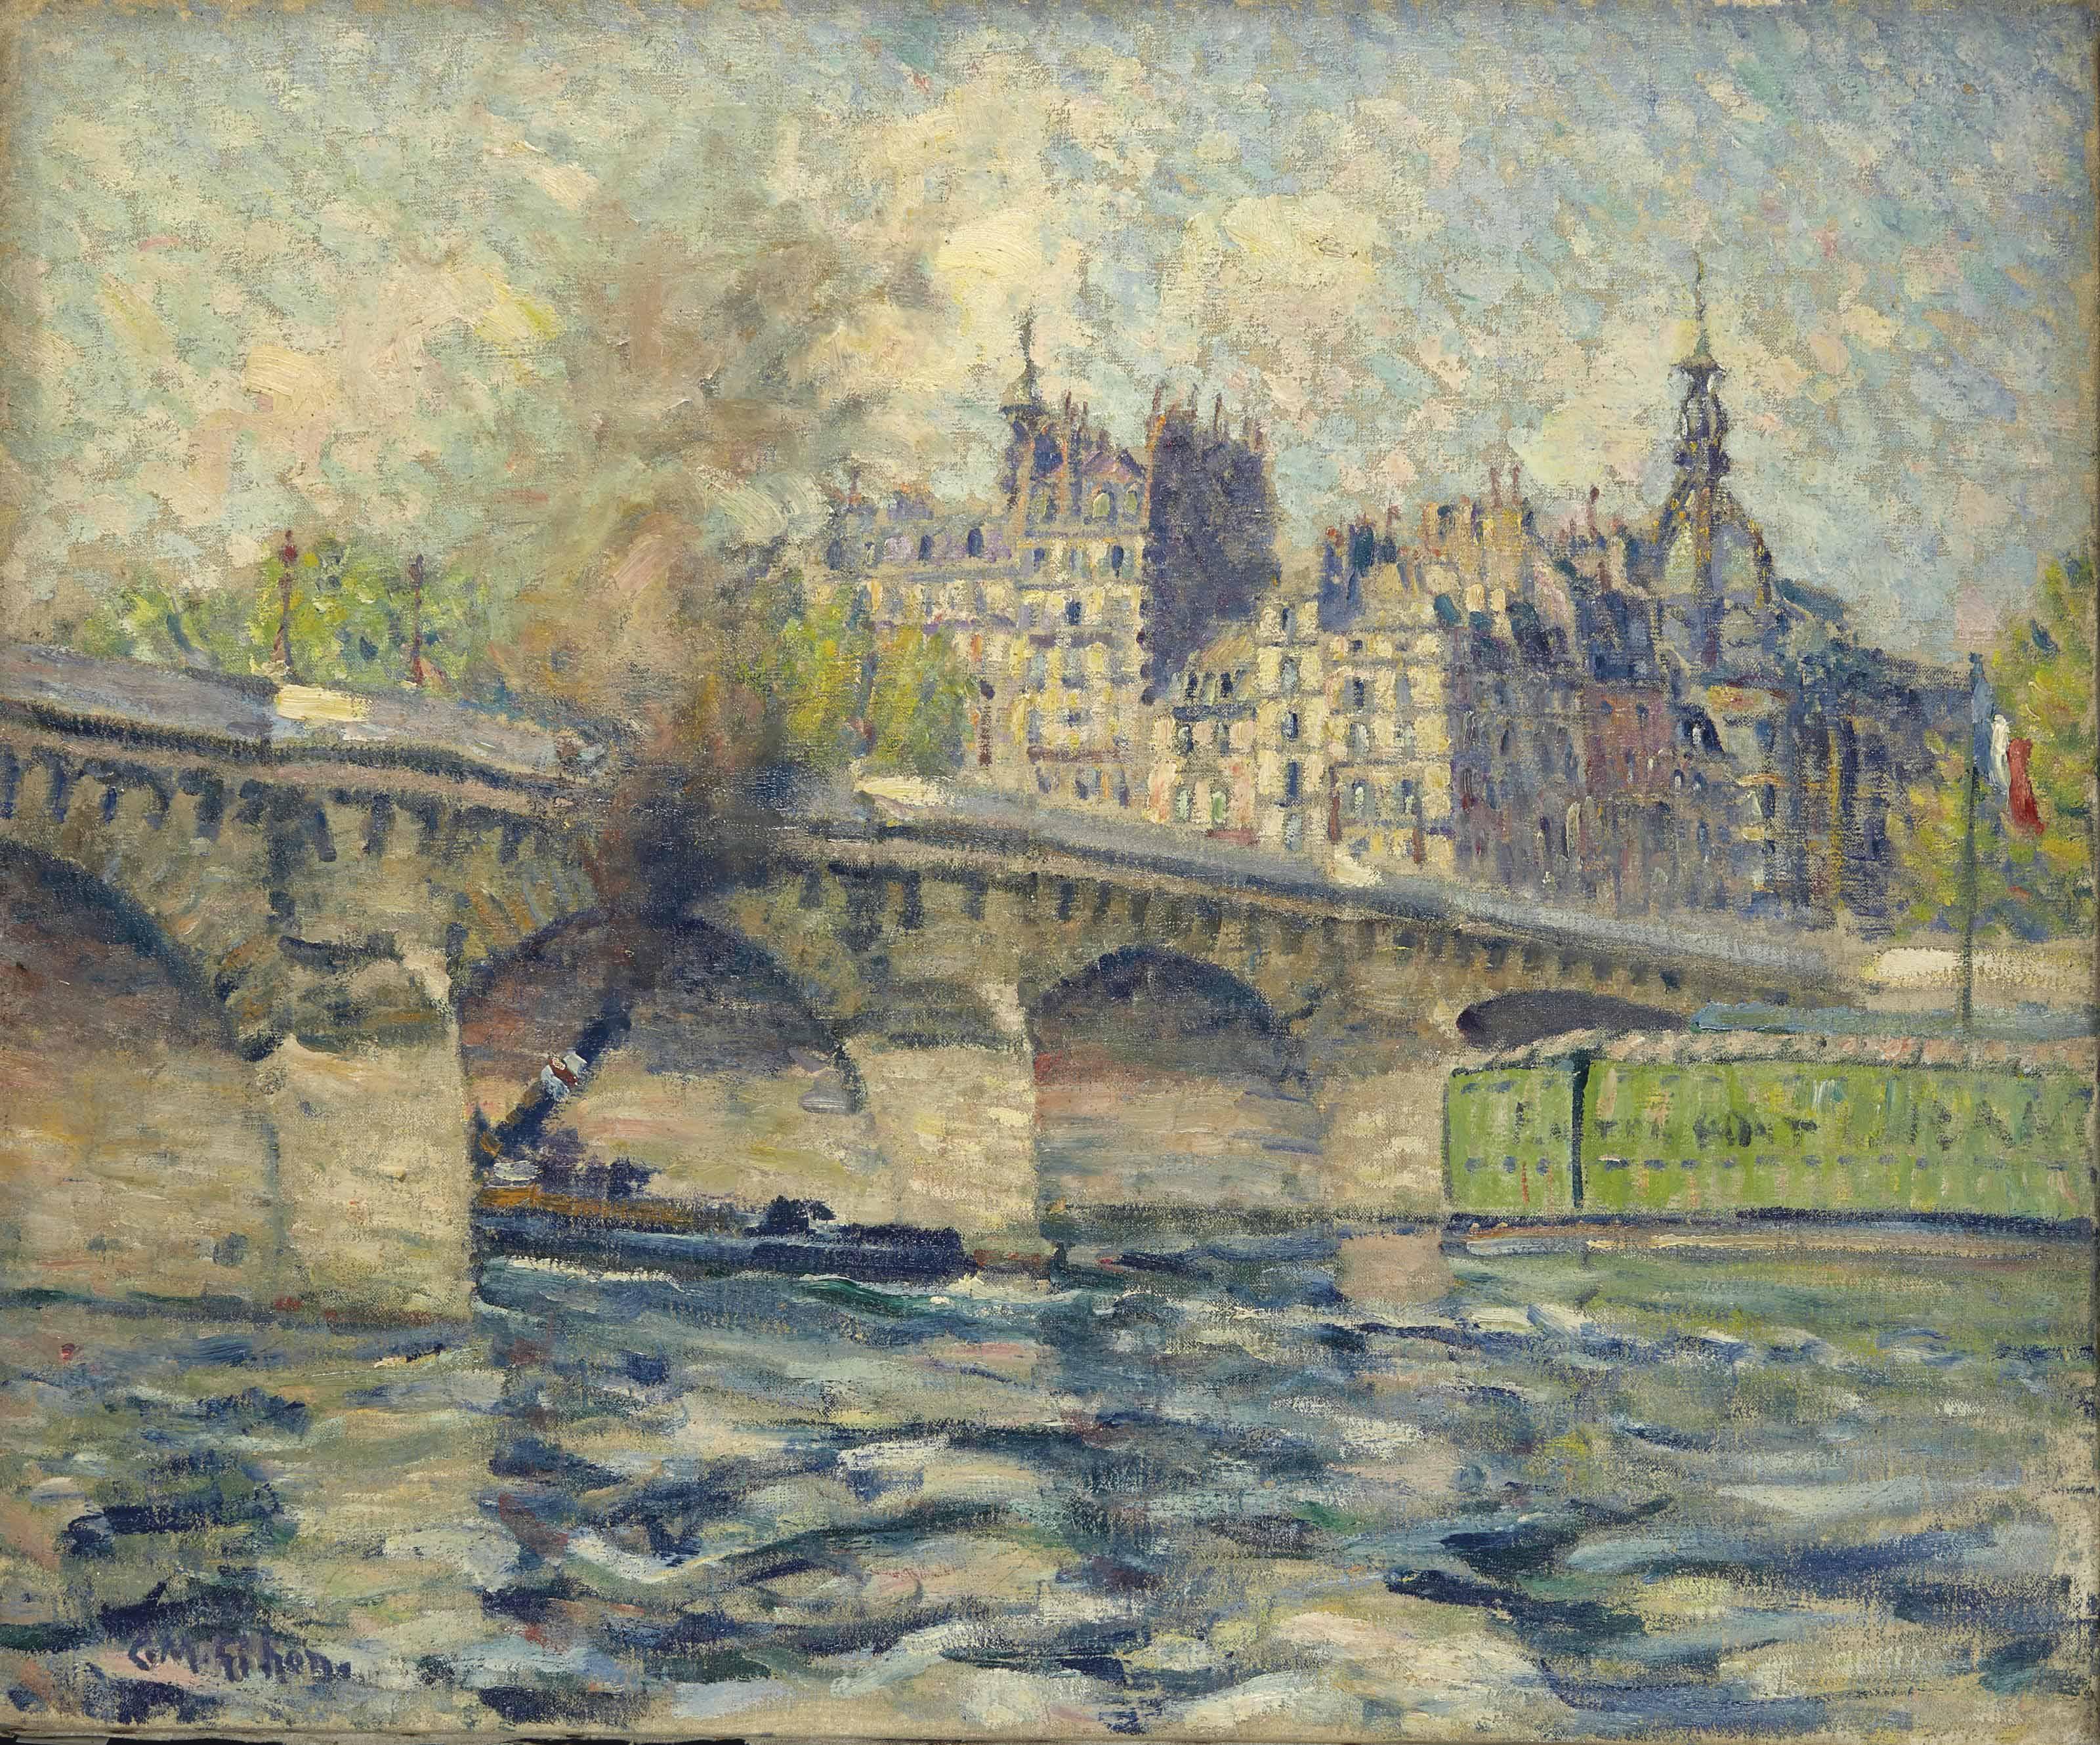 CLARENCE MONTFORT GIHON (1871-